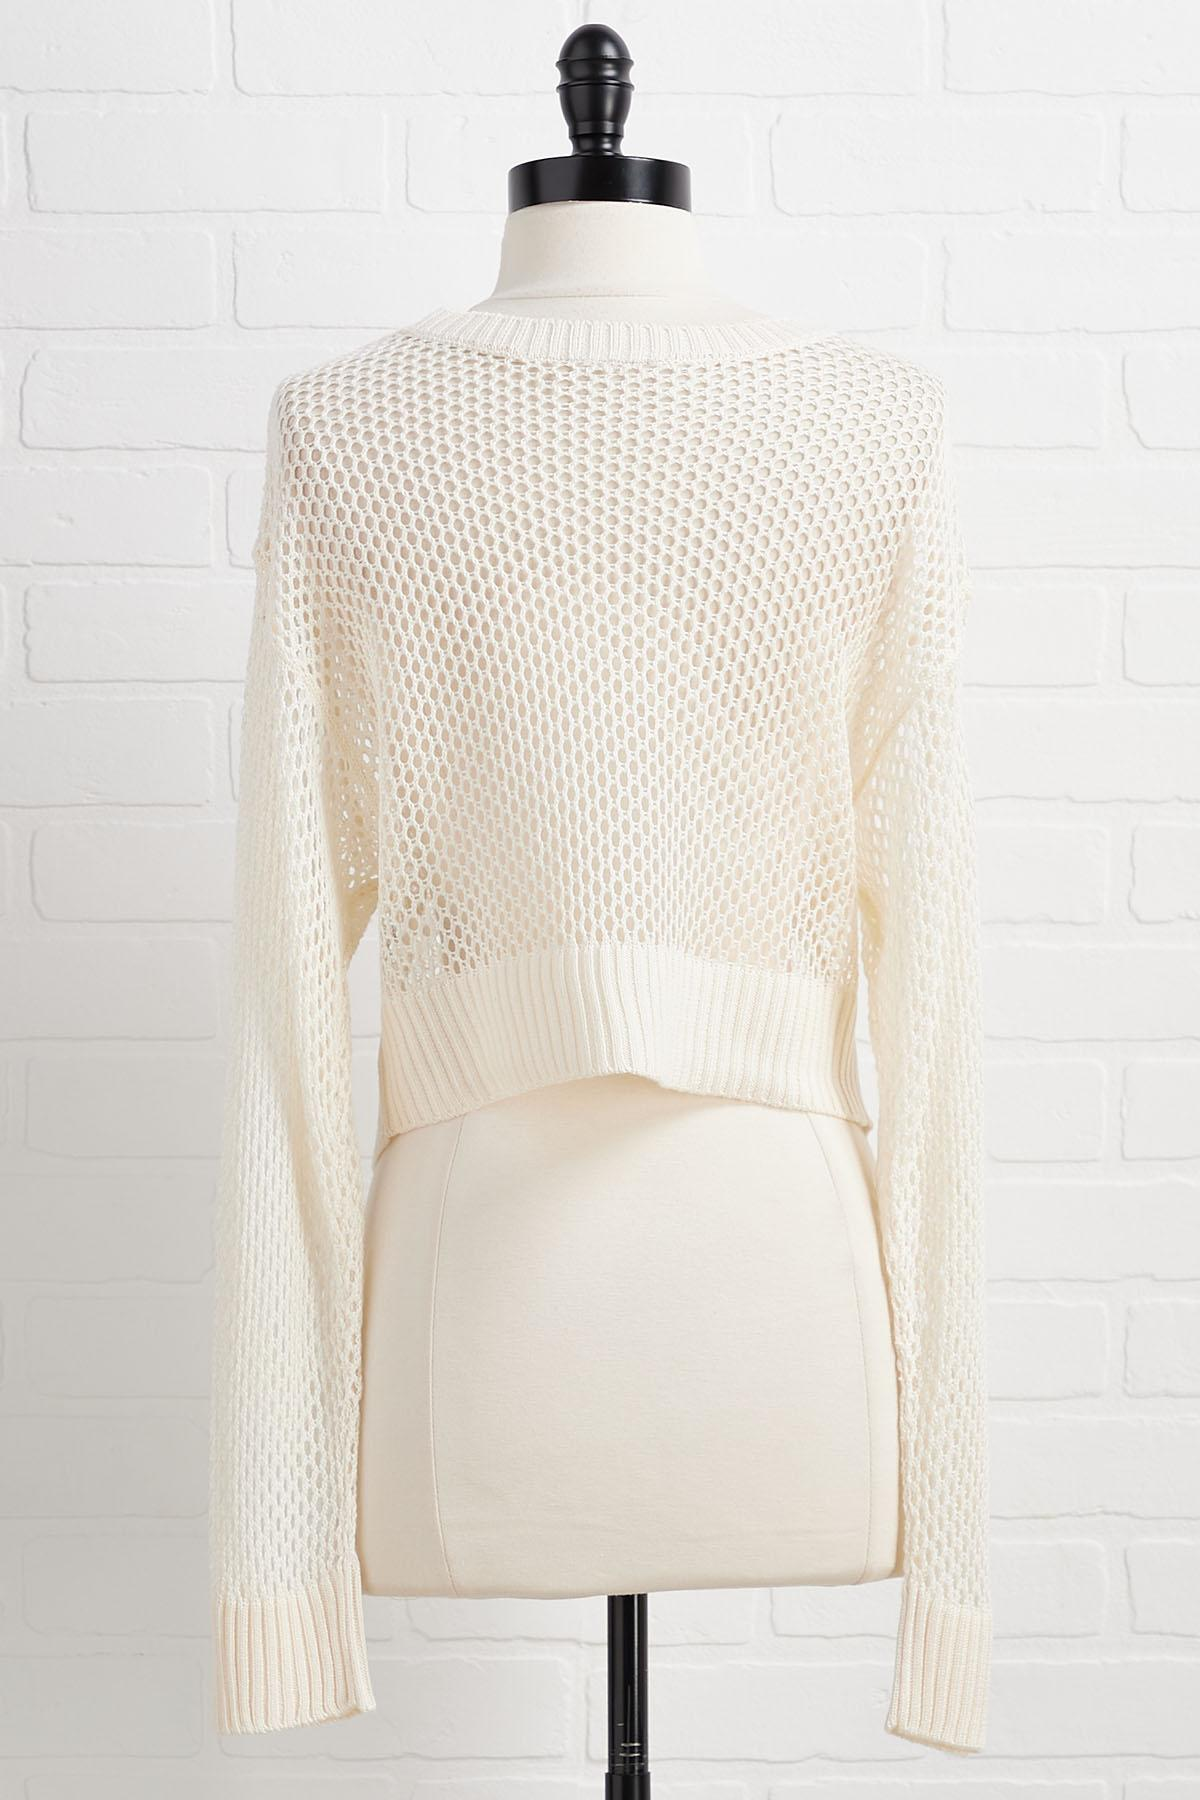 Sandcastles Sweater